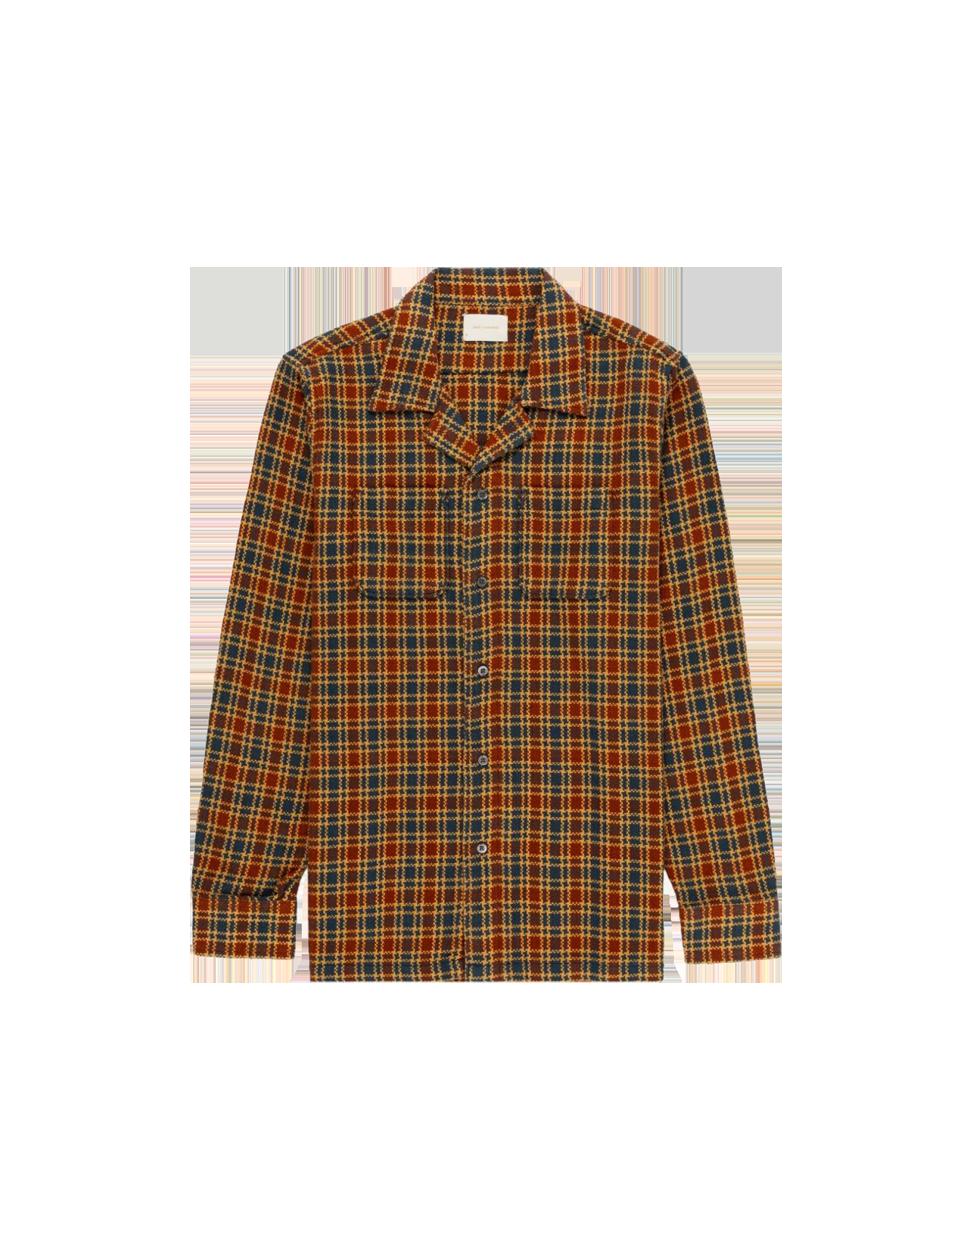 Aime Leon Dore woven shirt